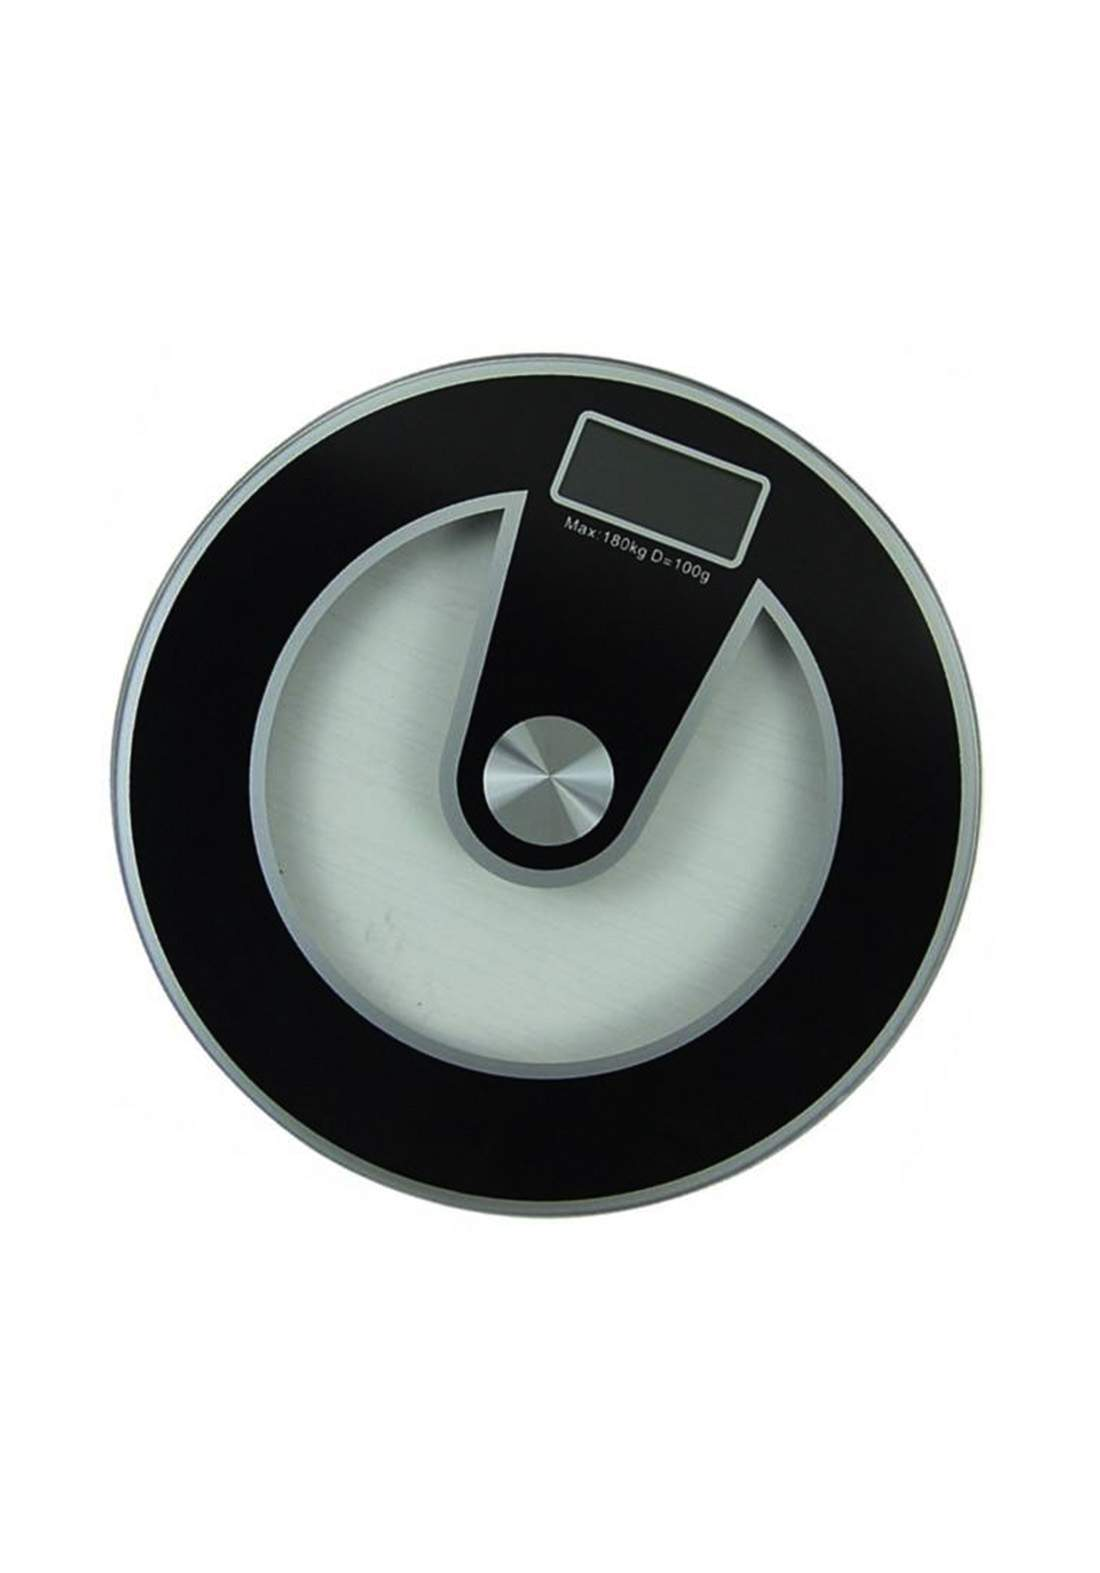 Electronic Personal Scale TOYE-EB618 ميزان رقمي لقياس الوزن